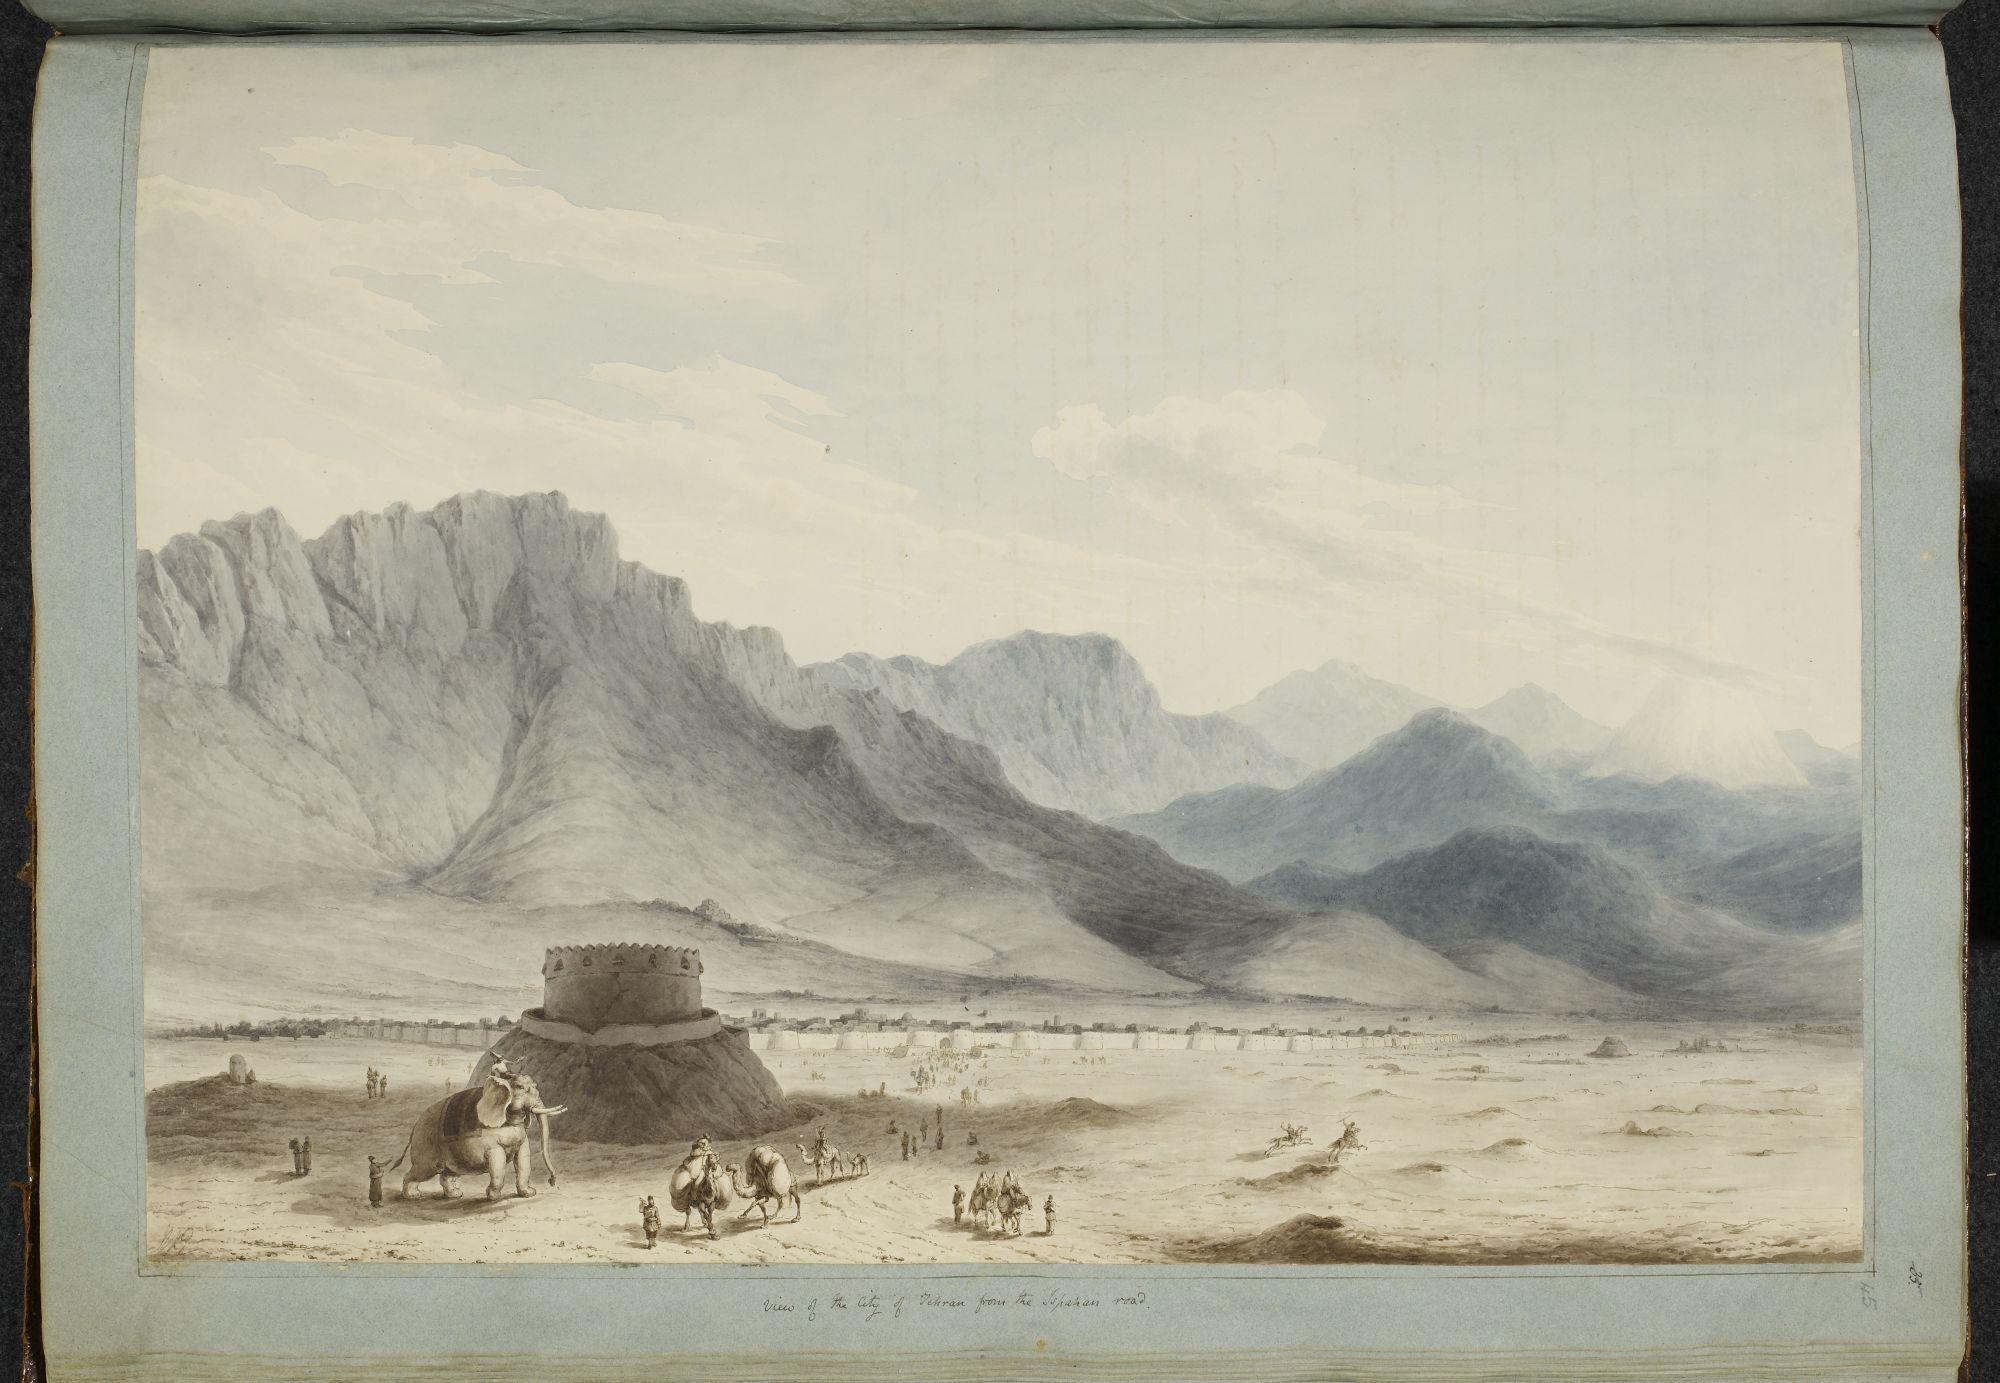 Teheran from the Isphahan road, by Sir Robert Ker Porter.